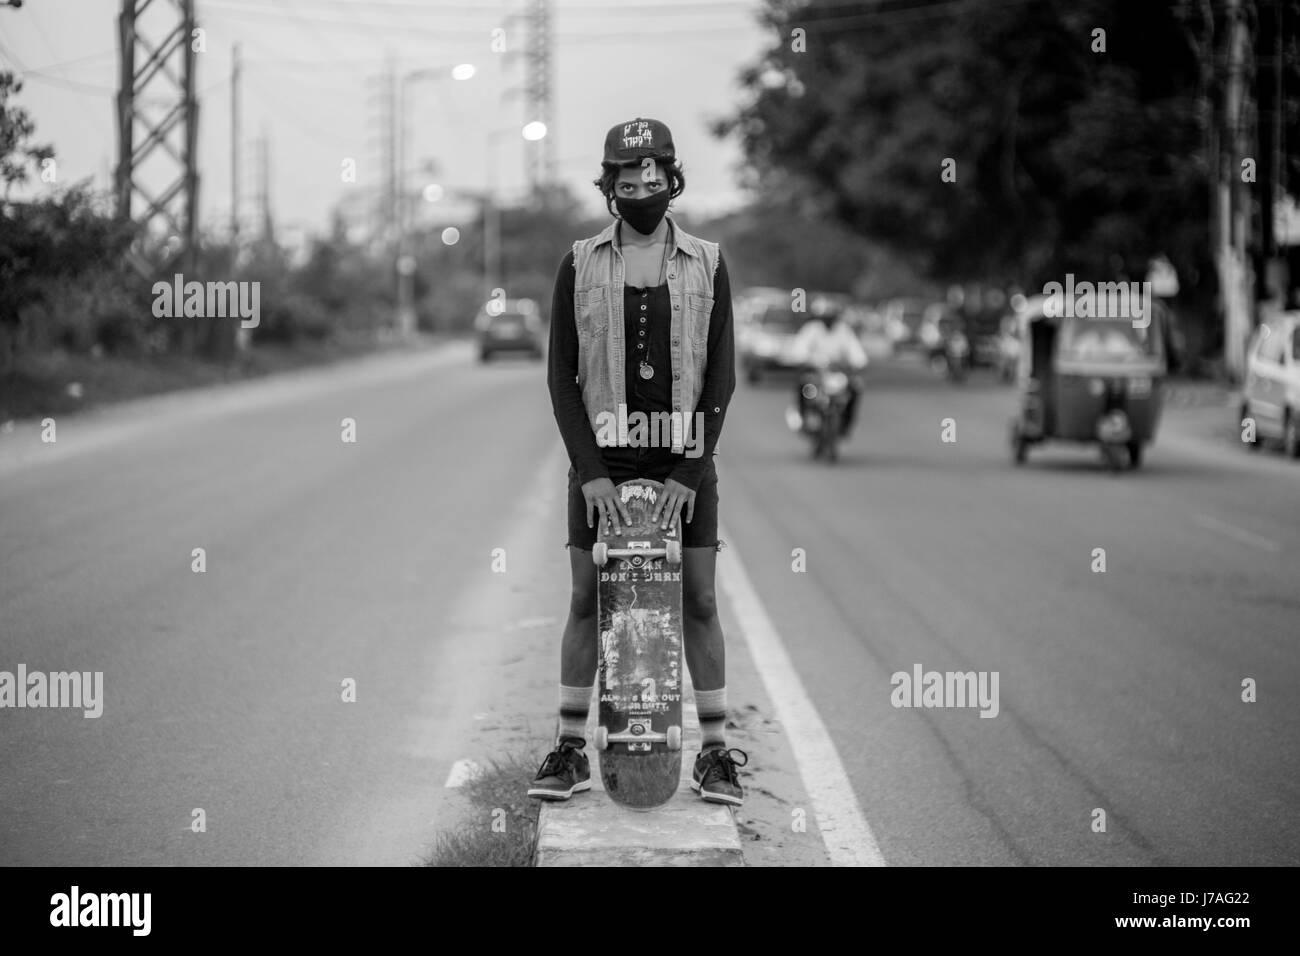 A black and white portrait of Atita Veghese, Indias first professional female skateboarder. - Stock Image